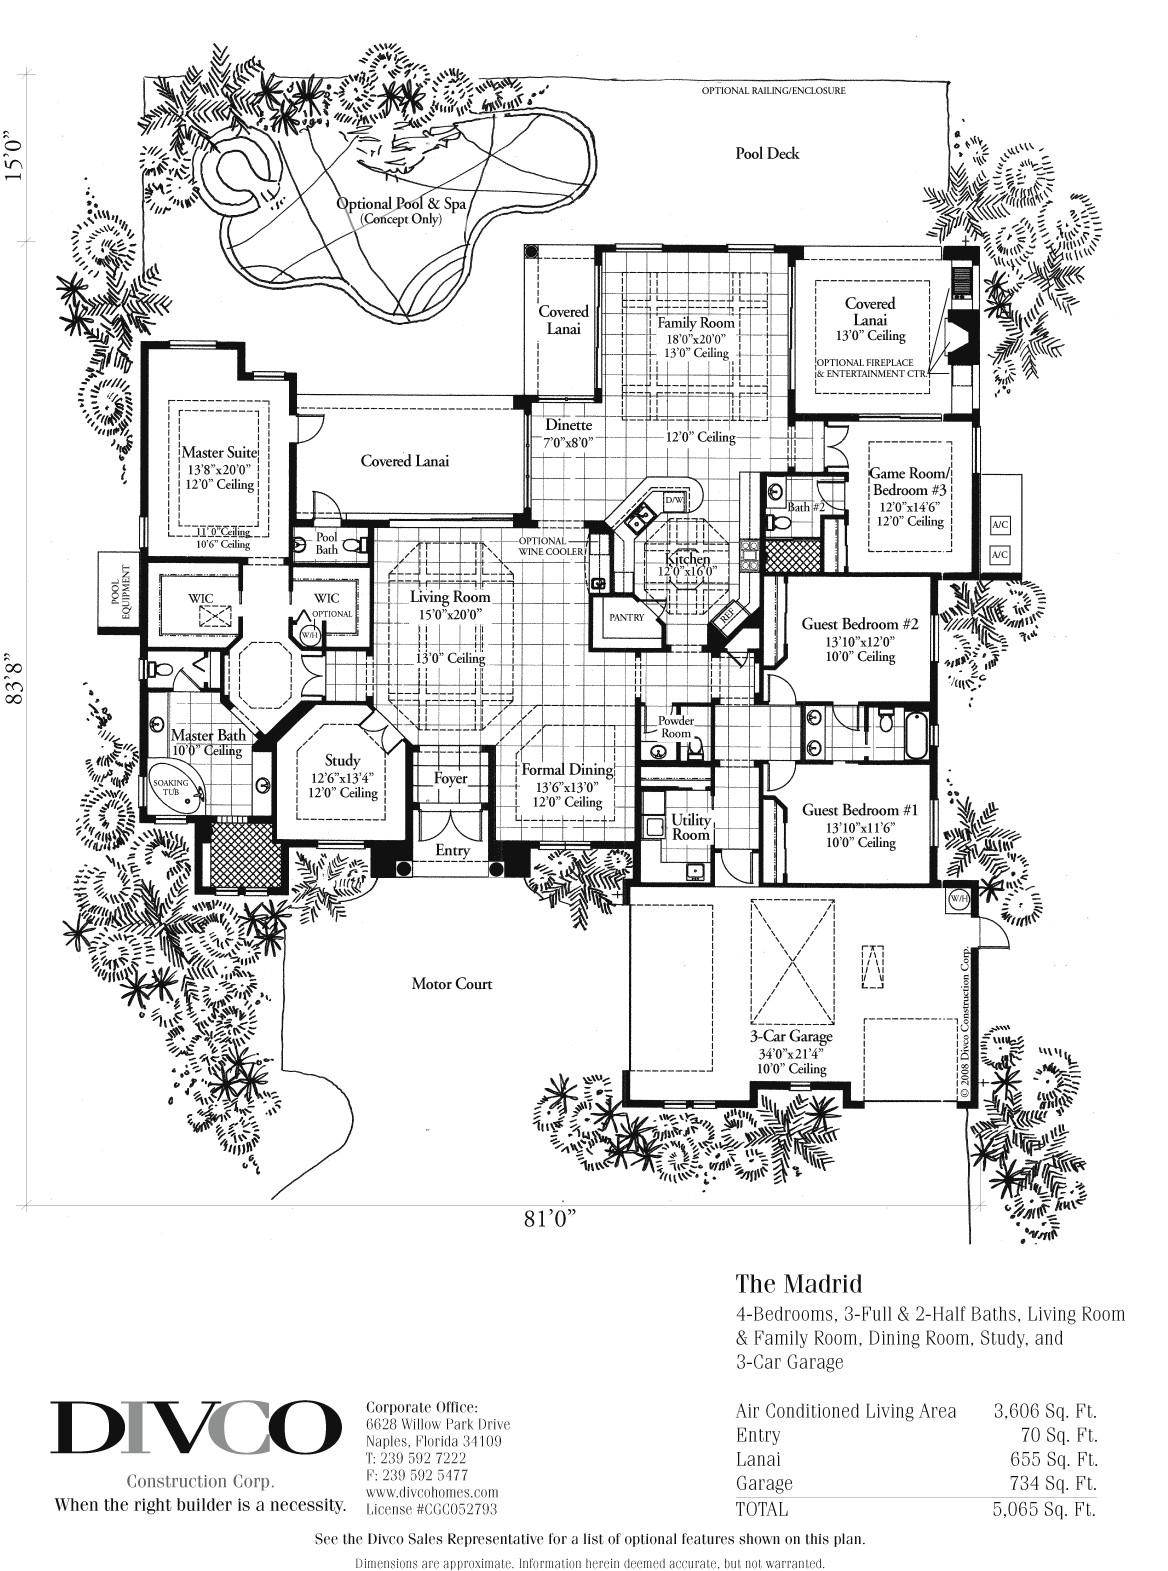 divco floor plan the madrid divco custom home builder florida